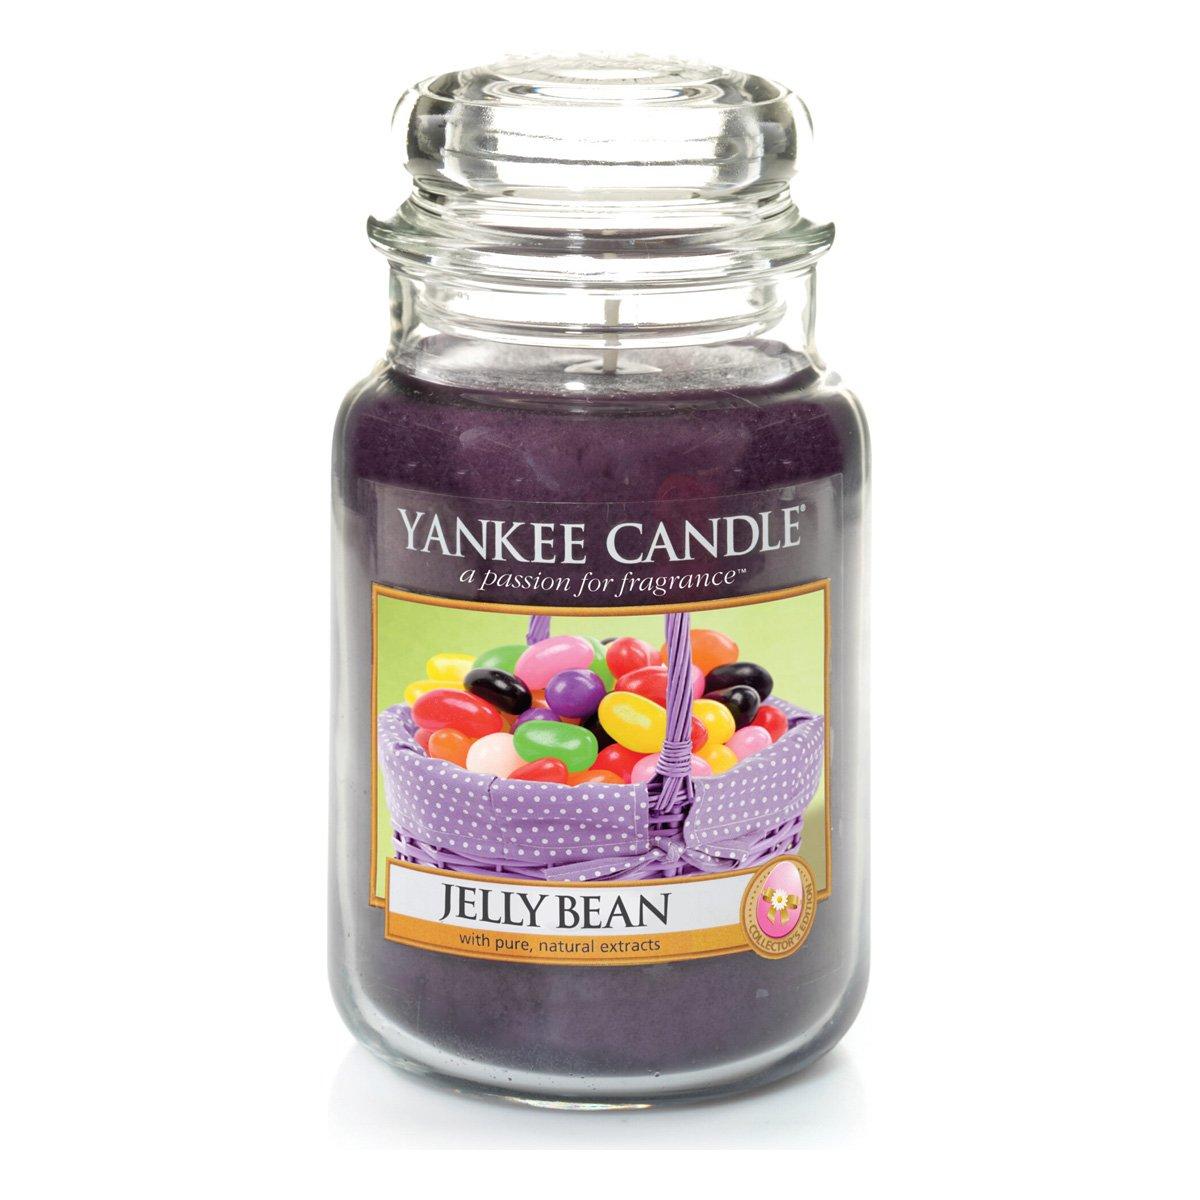 Yankee Candle 1328759E Jelly Bean Bougie Grande Jarre Verre Noir 10 x 9,8 x 14,7 cm